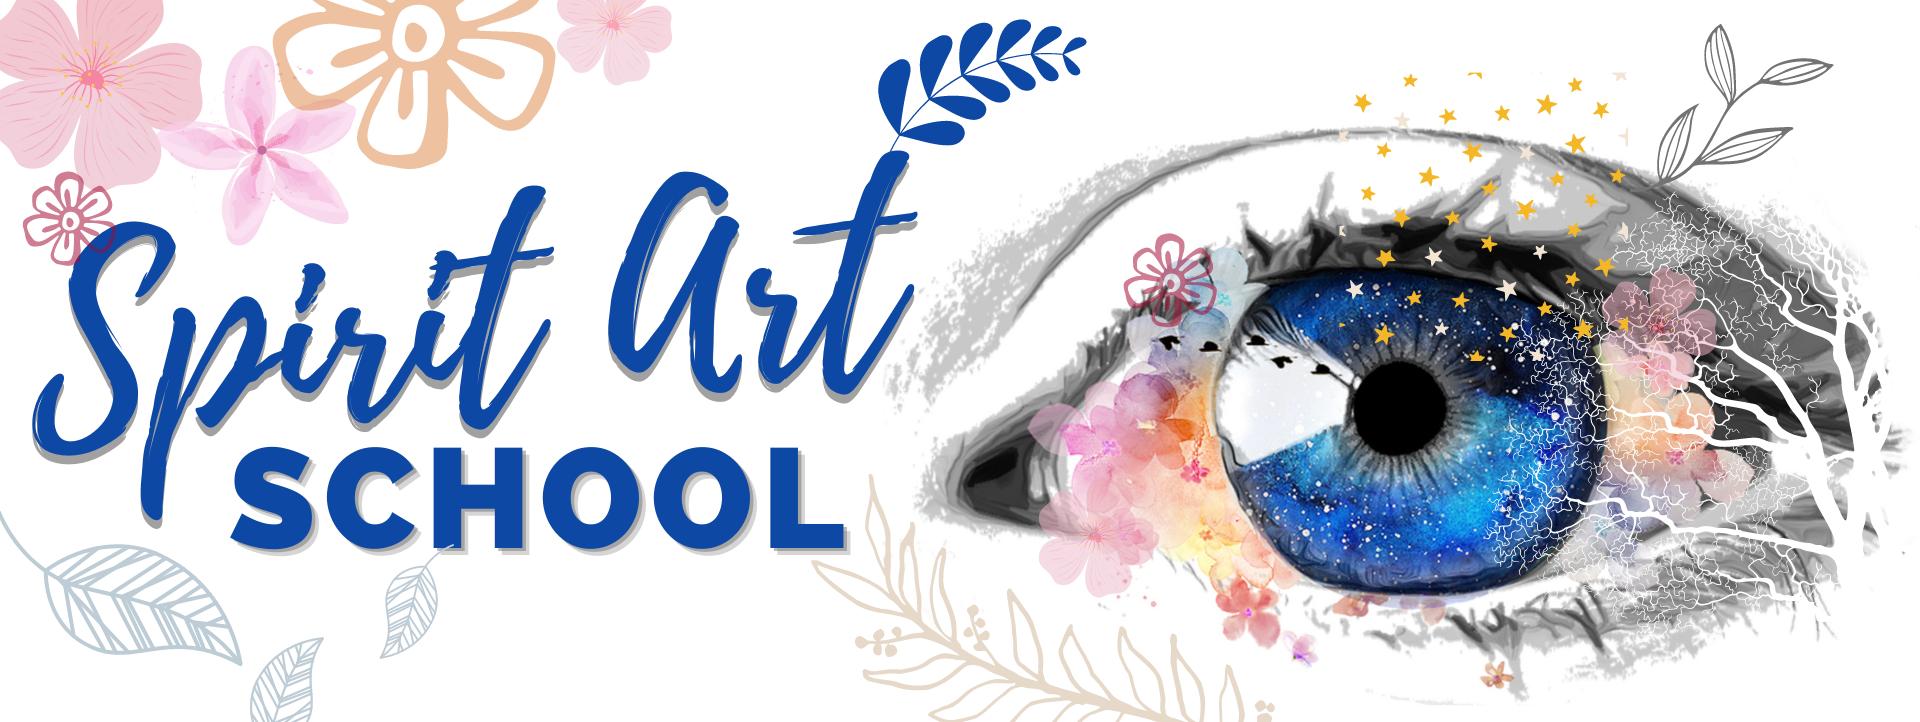 an eye with spirit art school and art design surrounding it